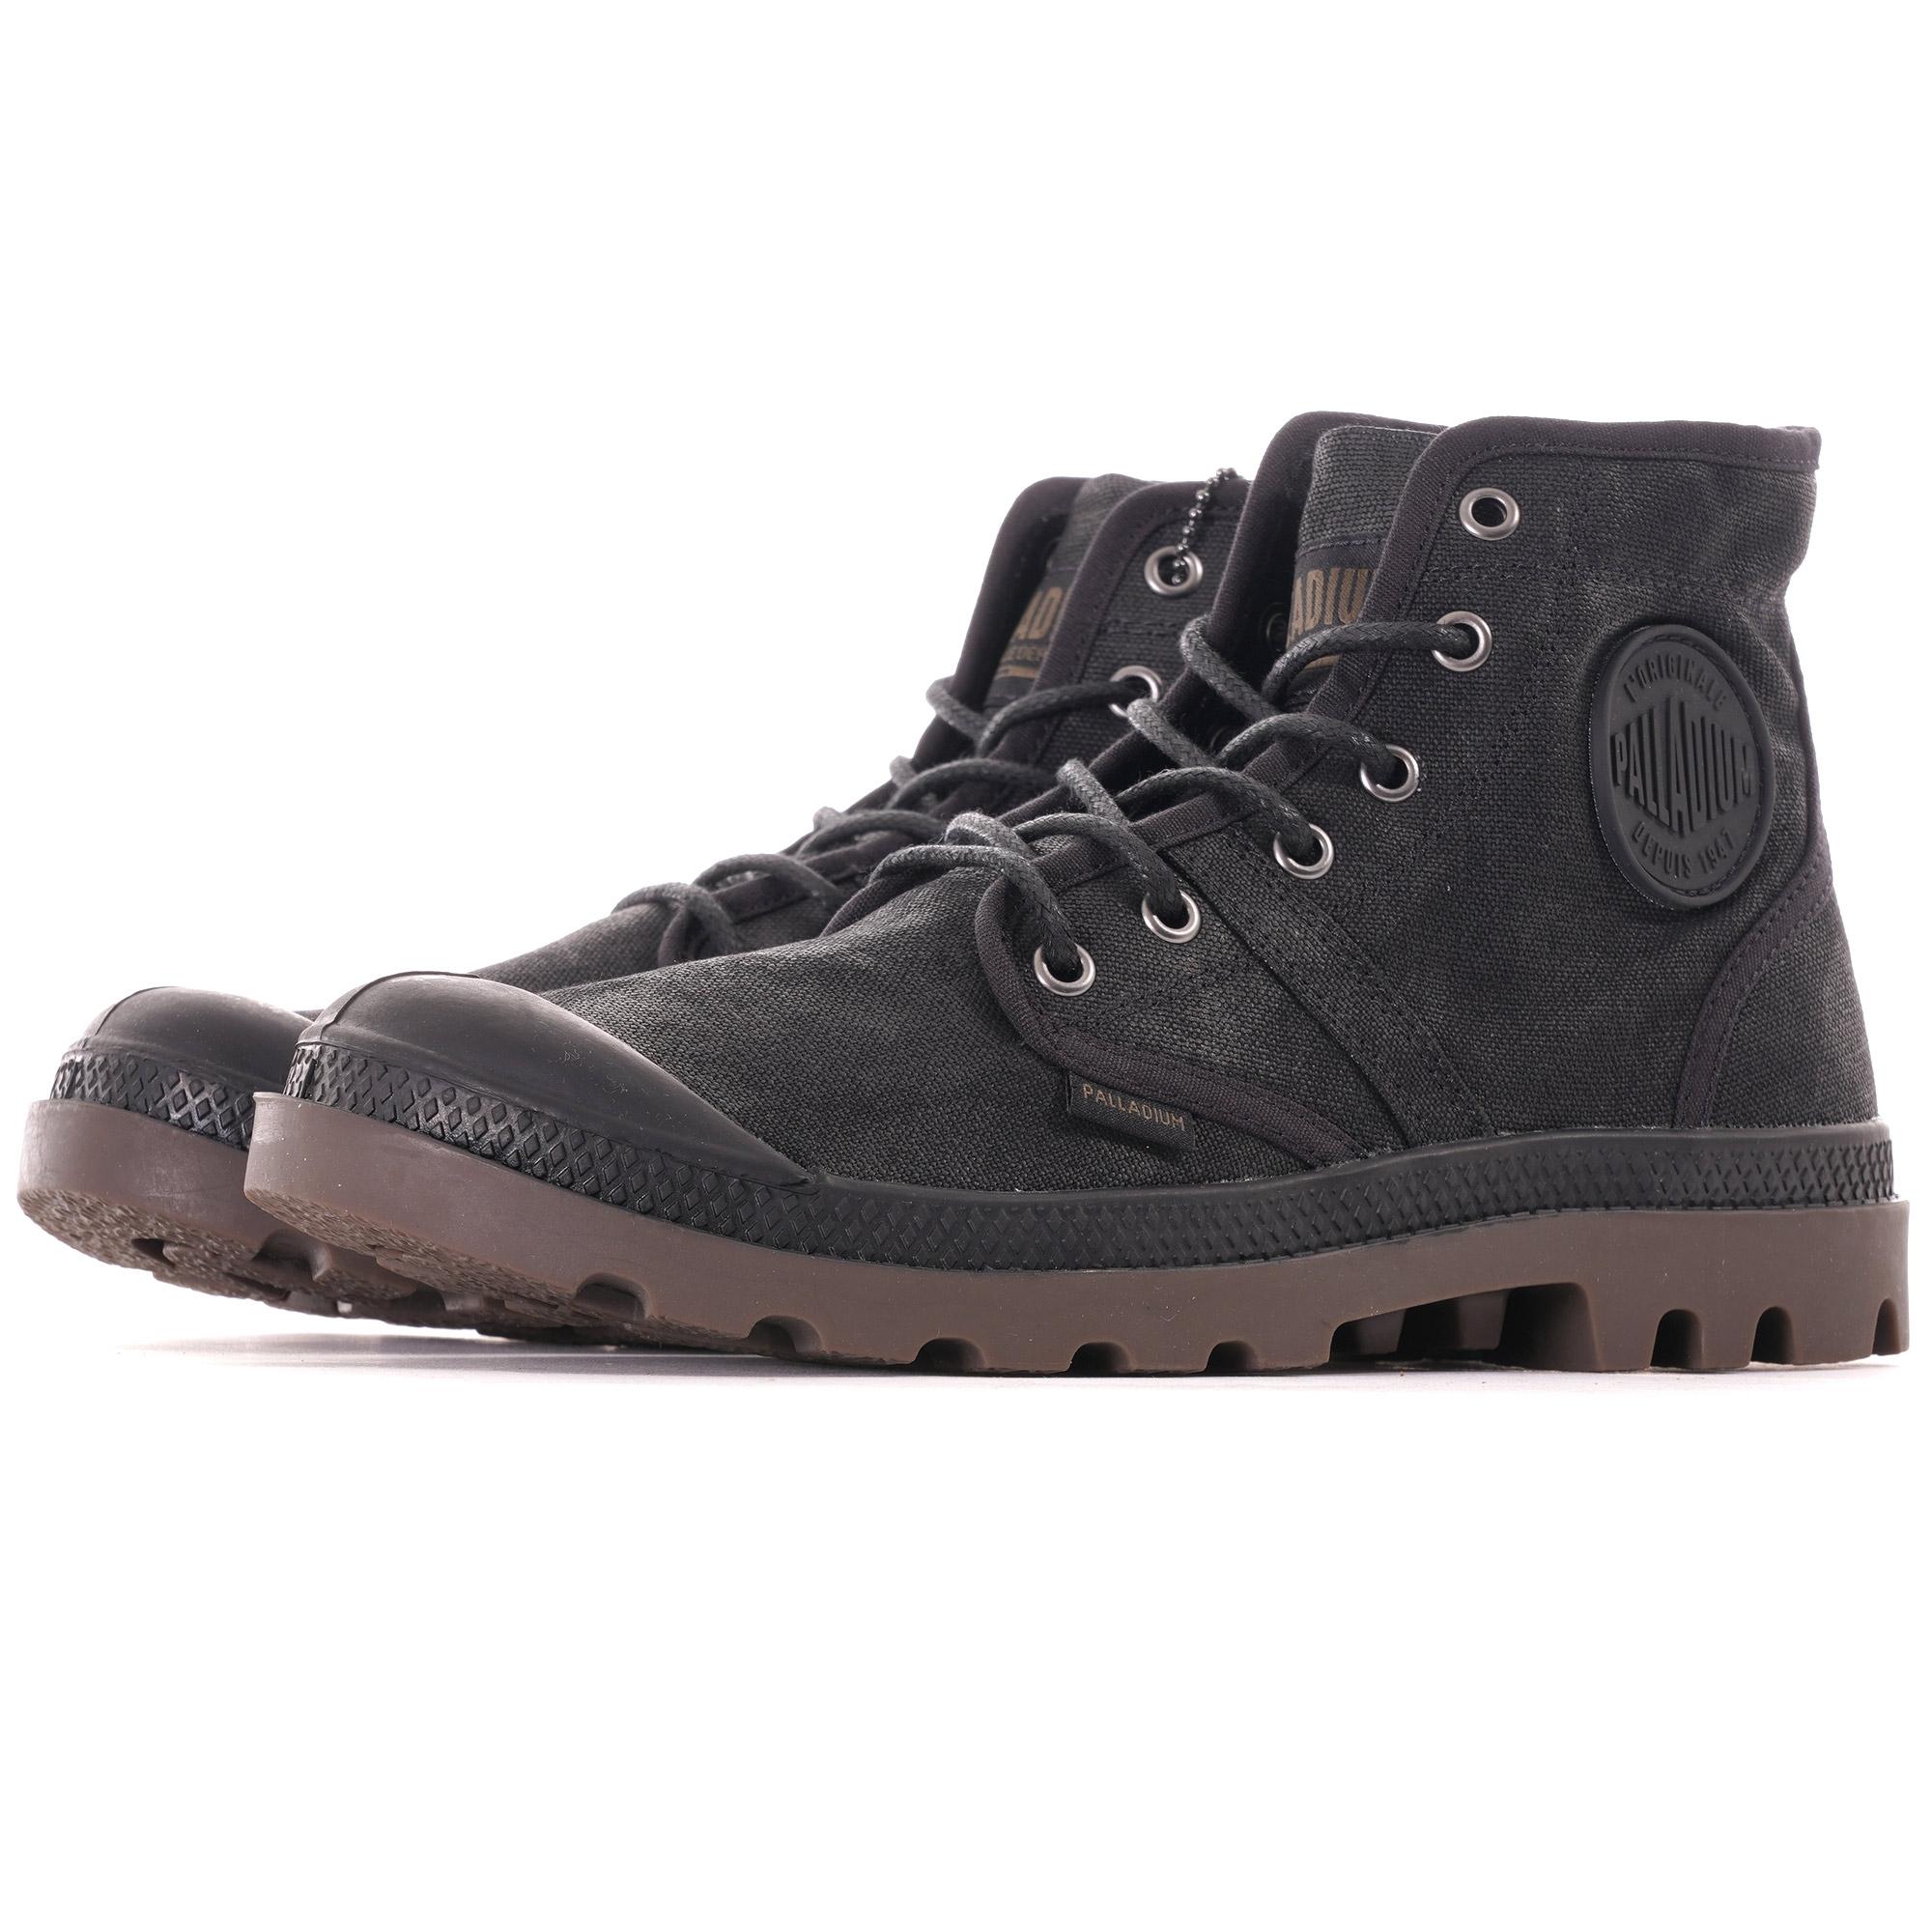 Palladium Pallabrouse Wax Black Dark Gum Women Canvas Ankle Military Style Boots